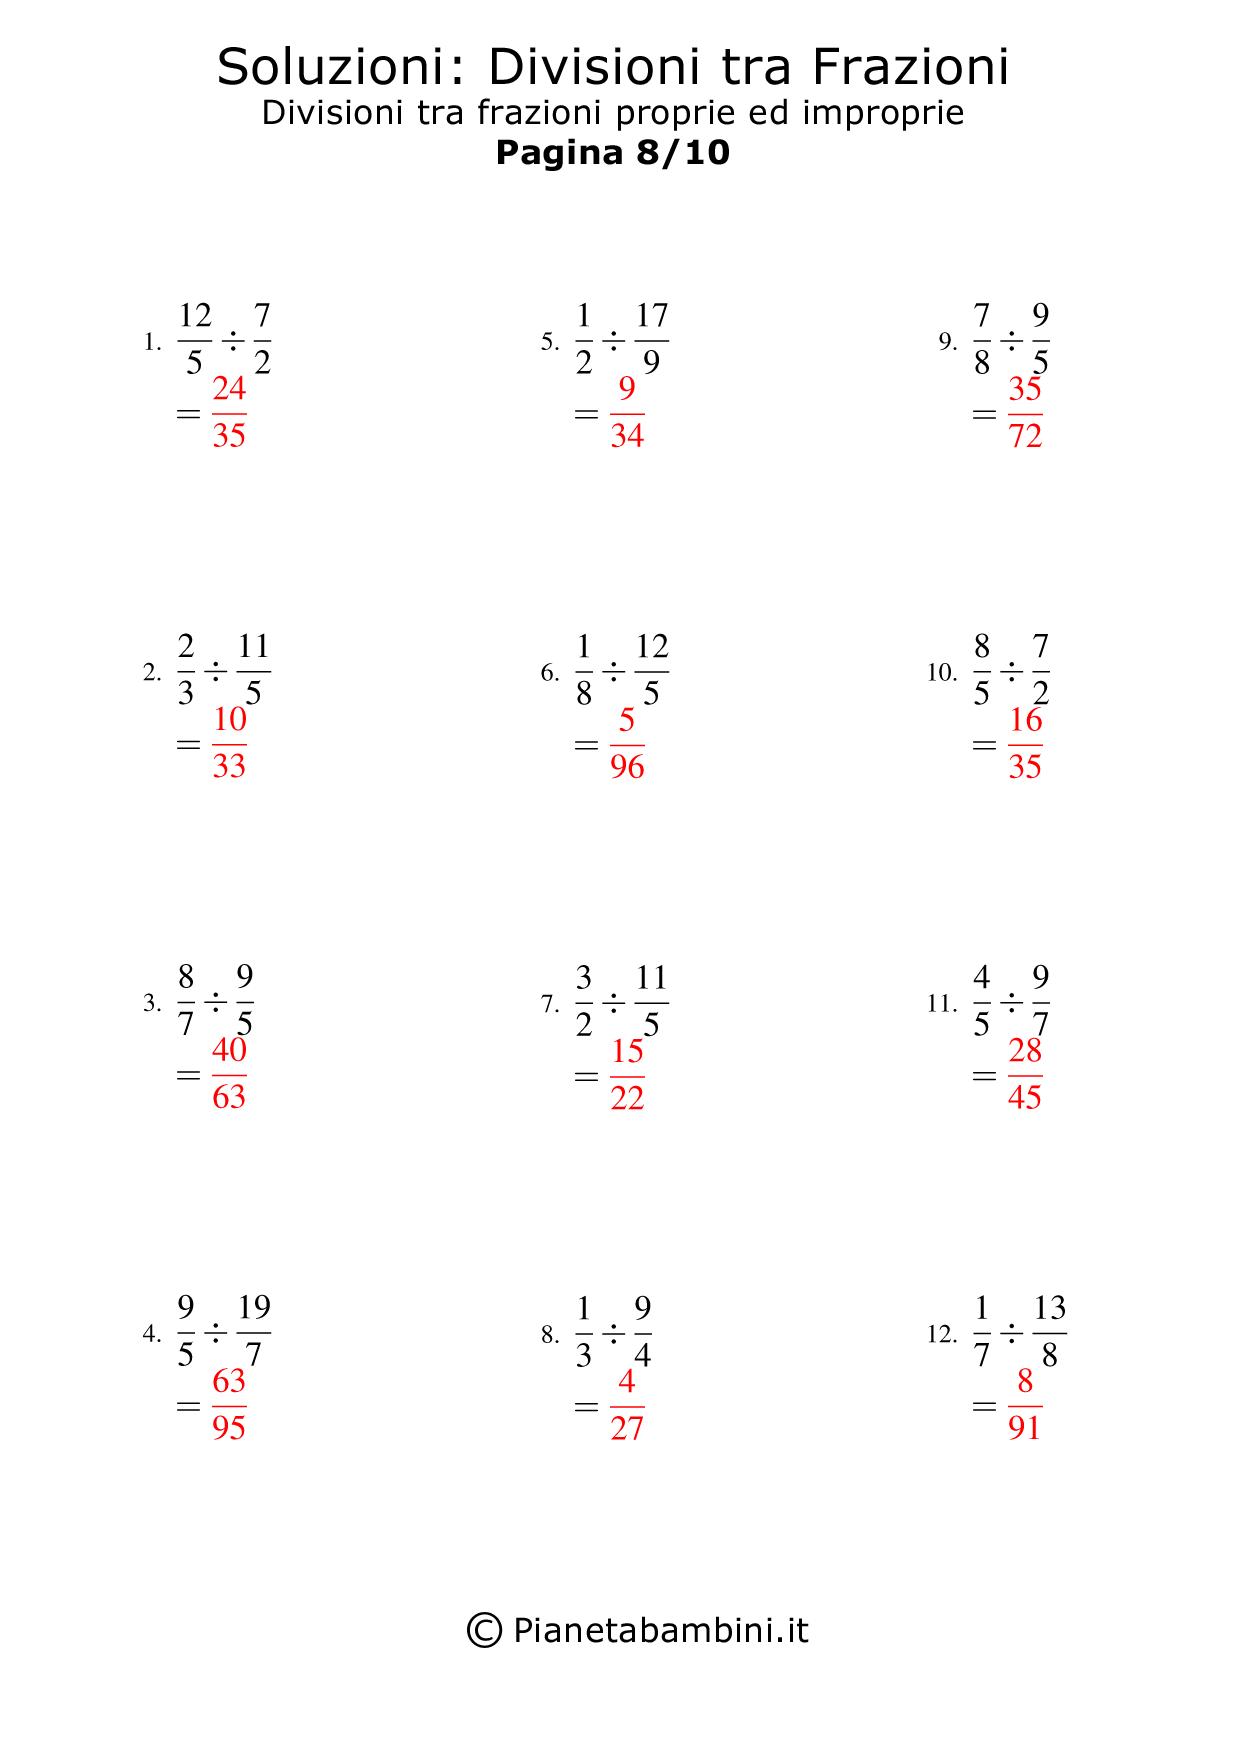 Soluzioni-Divisioni-Frazioni-Proprie-Improprie_08